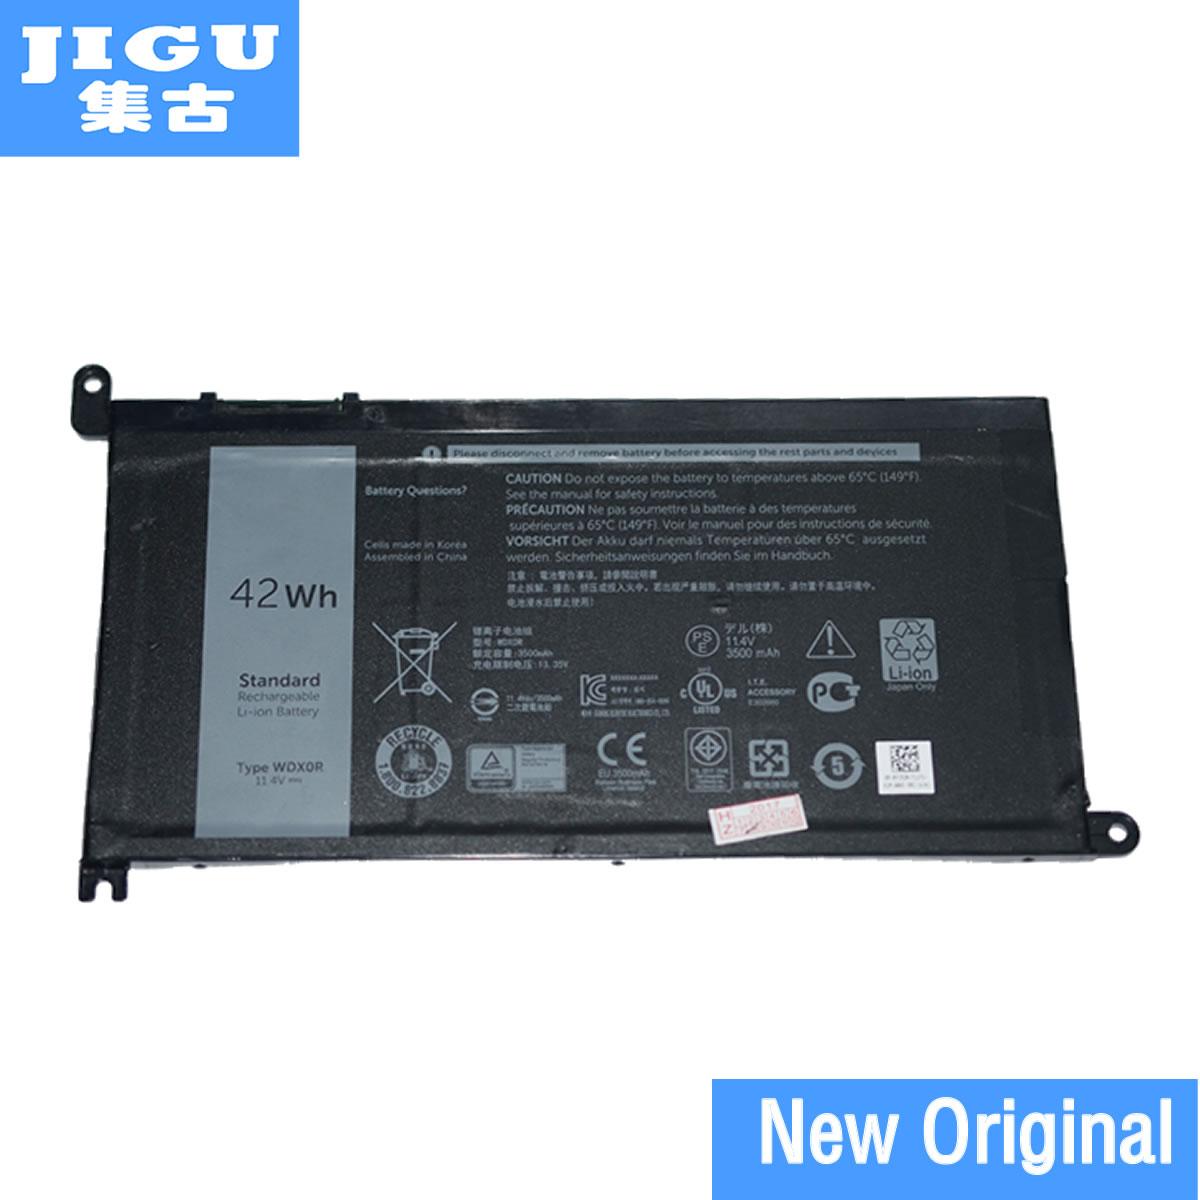 JIGU Original Laptop Battery 3CRH3 WDX0R T2JX4 WDXOR For DELL 15MF PRO-1508T For Inspiron 13 5000 5368 5378